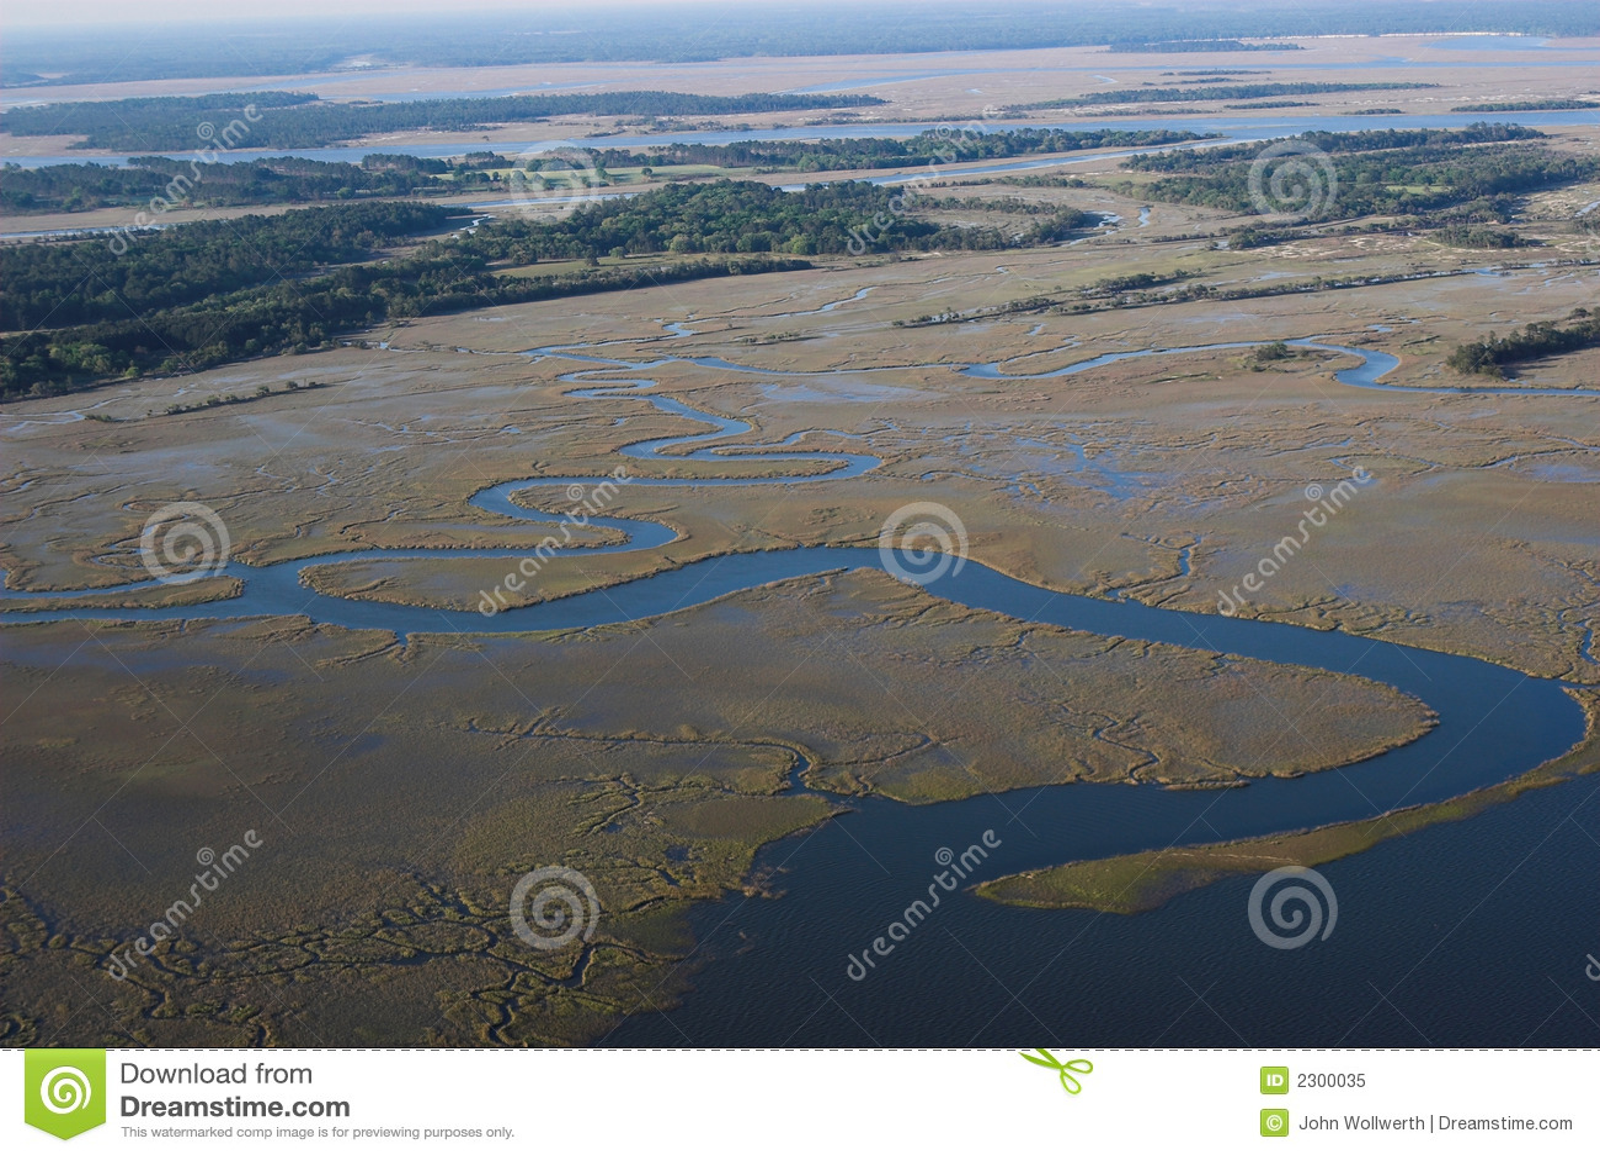 Meandering river delta